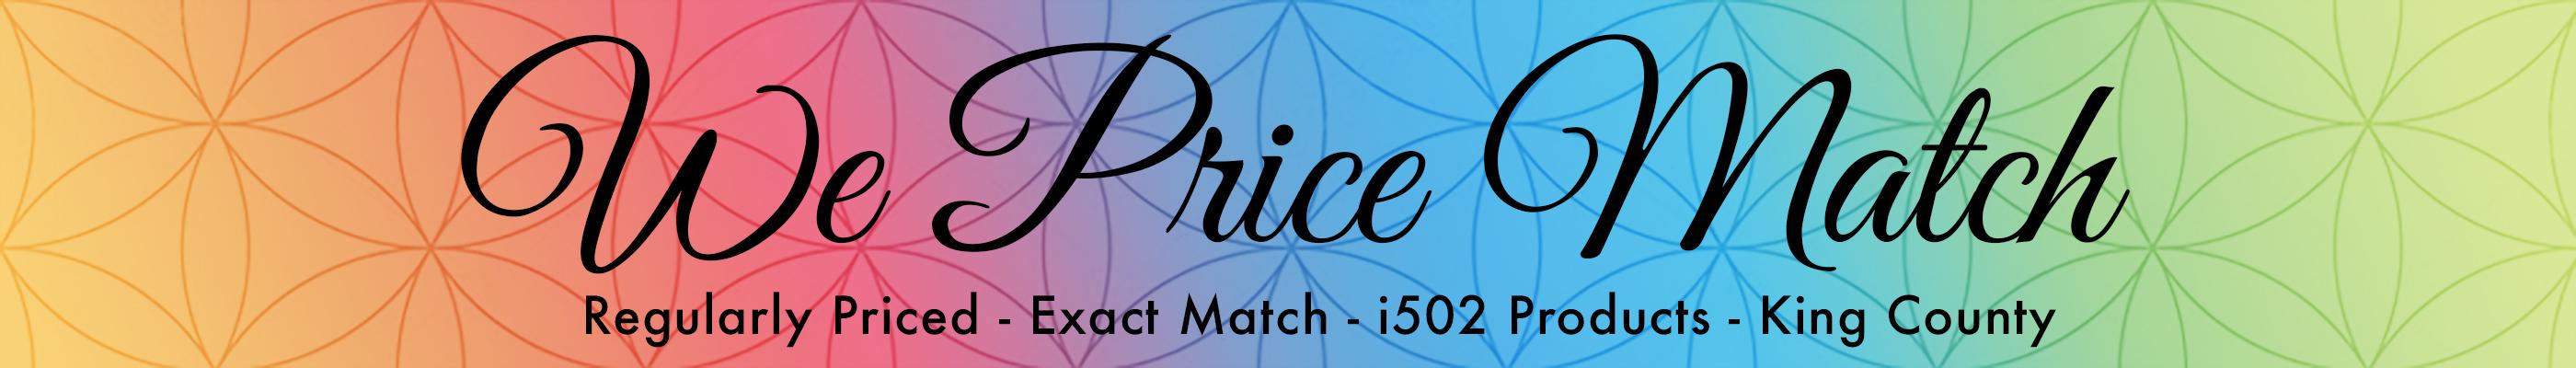 Herbs House Price Match